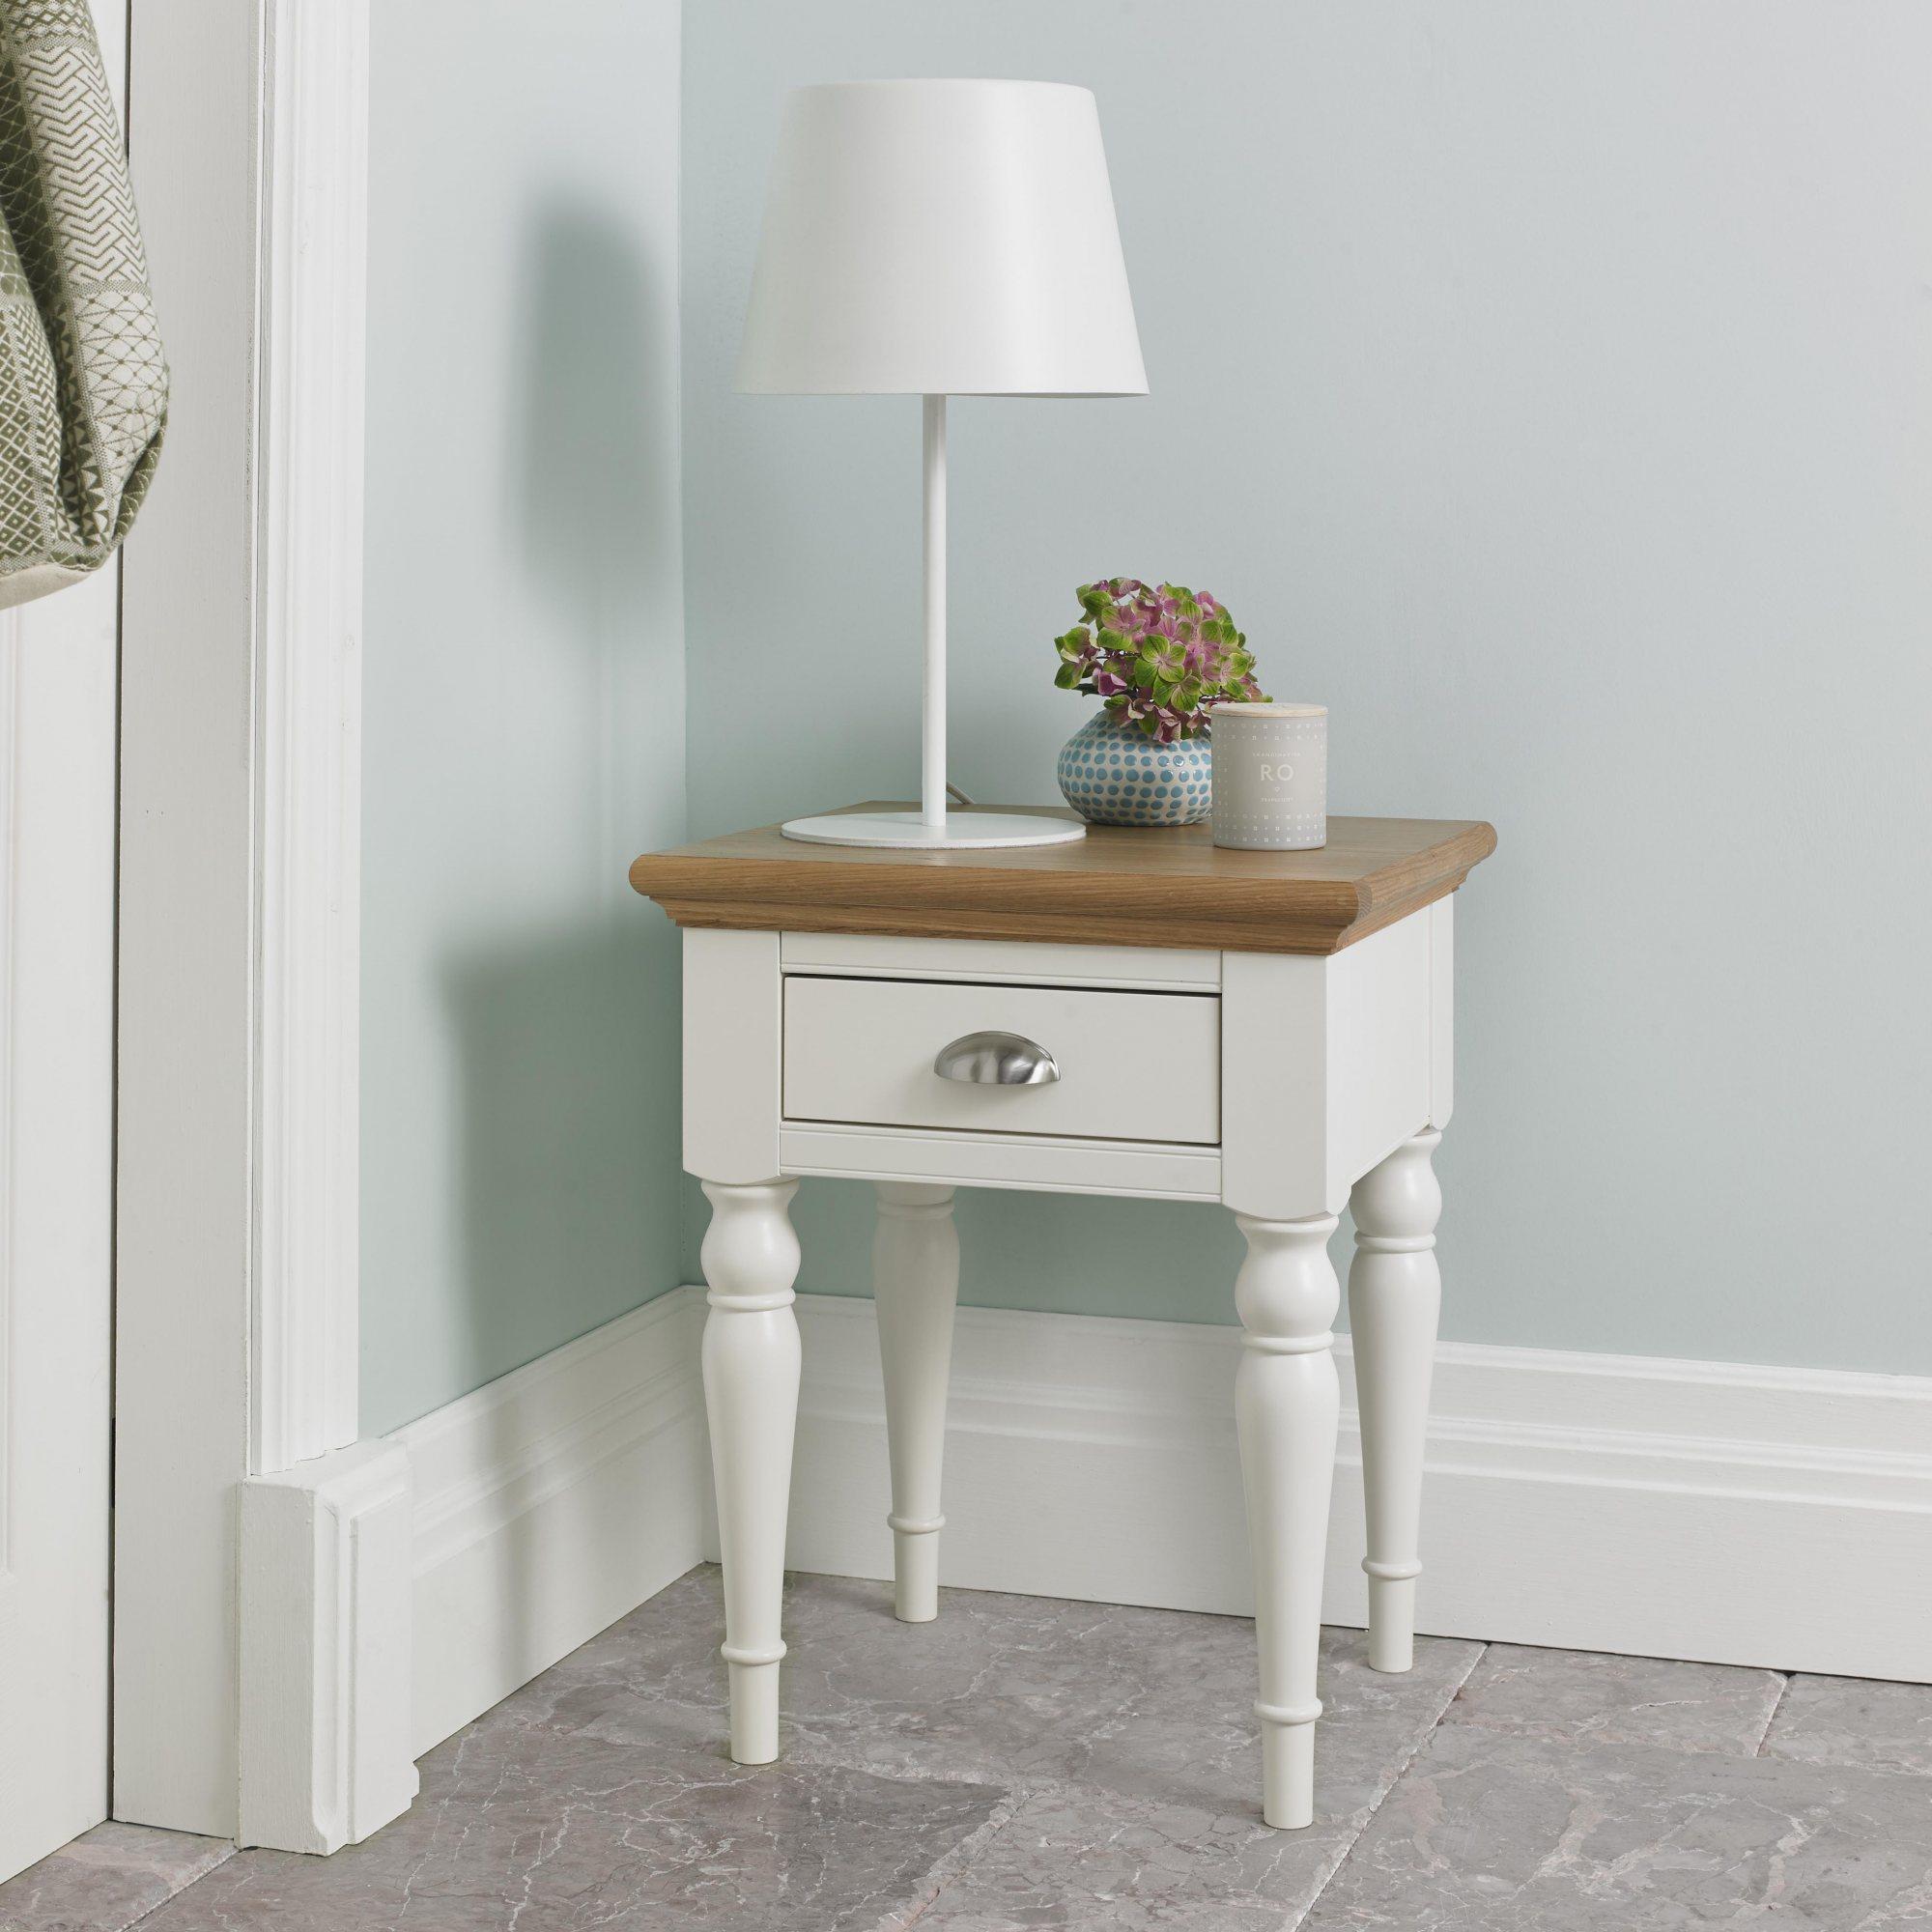 KYRA TWO TONE LAMP TABLE - L46cm x D43cm x H57cm